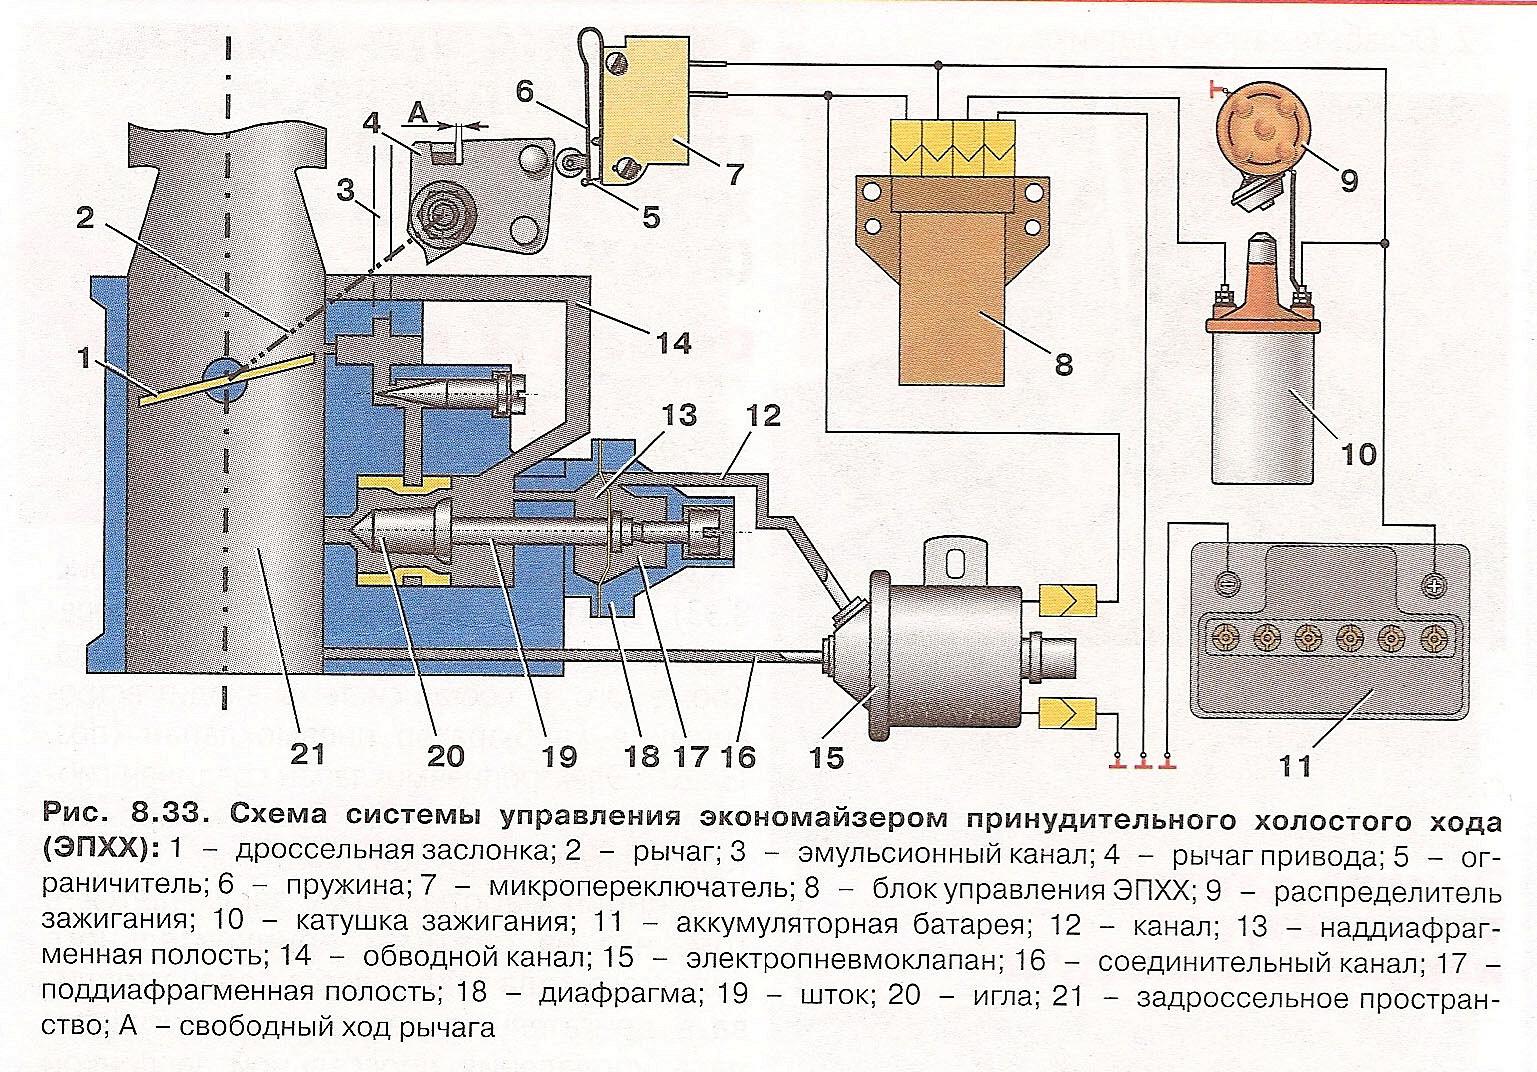 Схема подключения эпхх ваз 2108